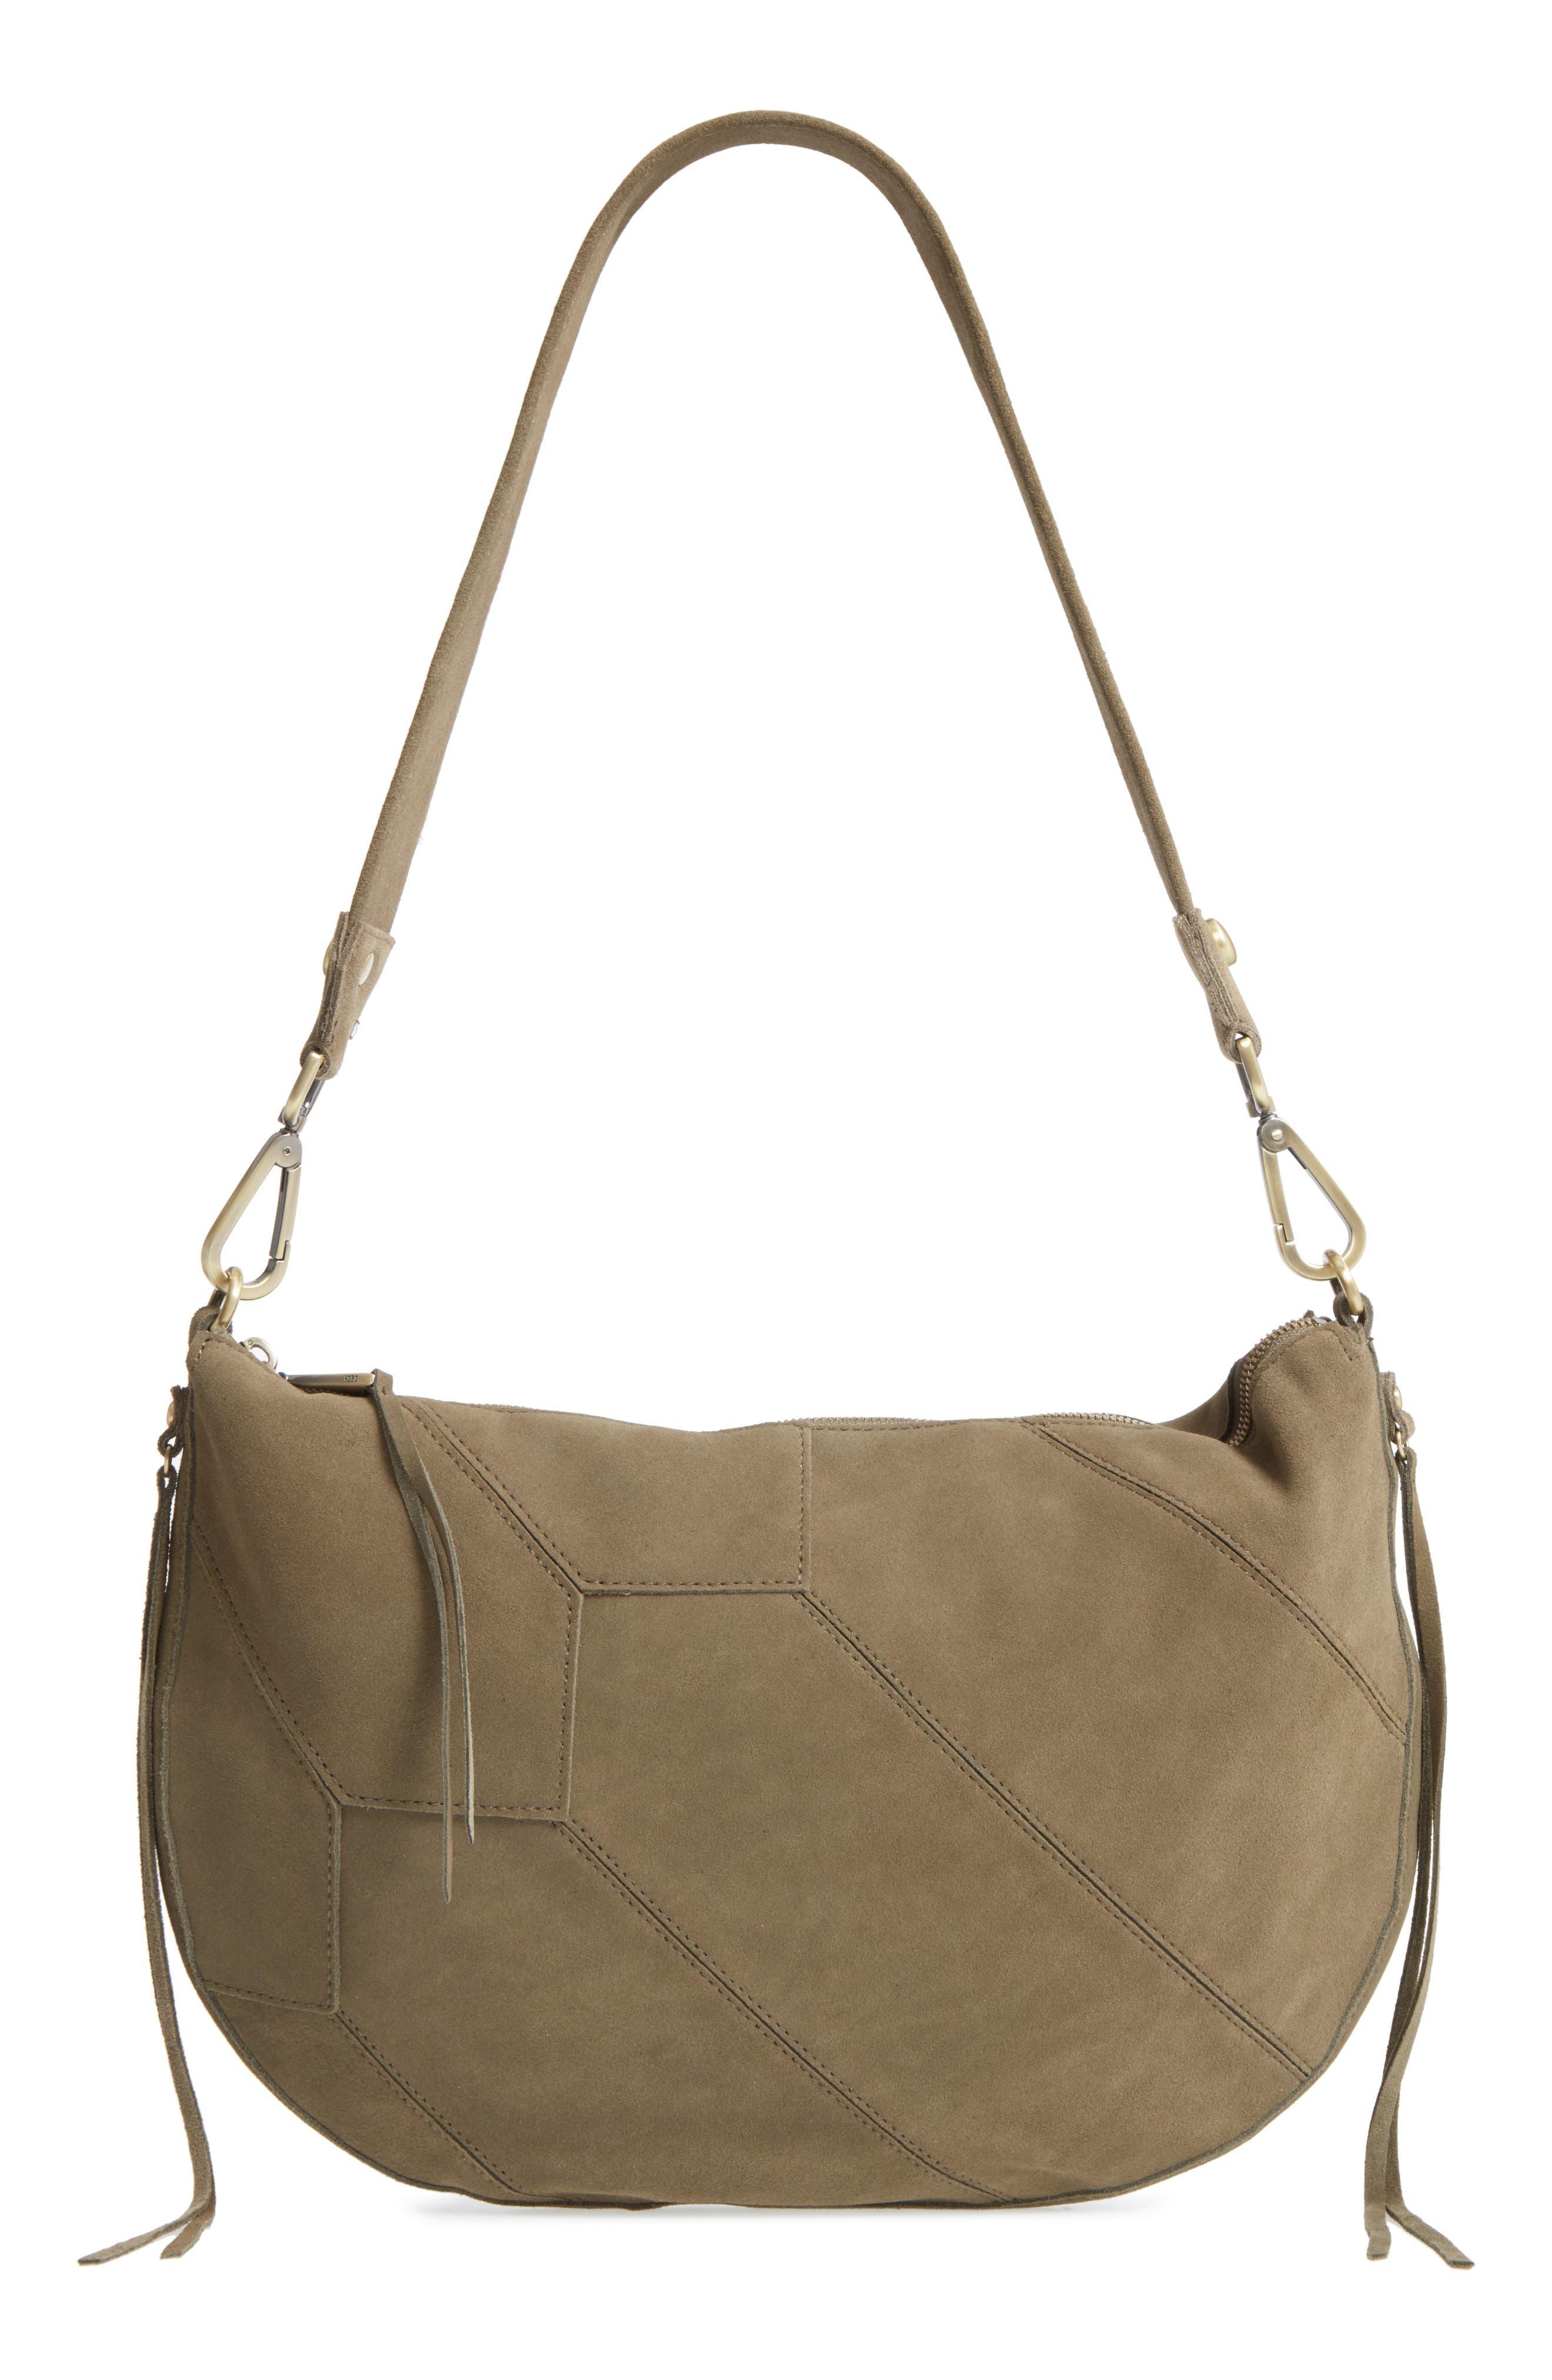 681cb9c101 ... Hobo Hobo Bags Handbags Purses Nordstrom Coach ...